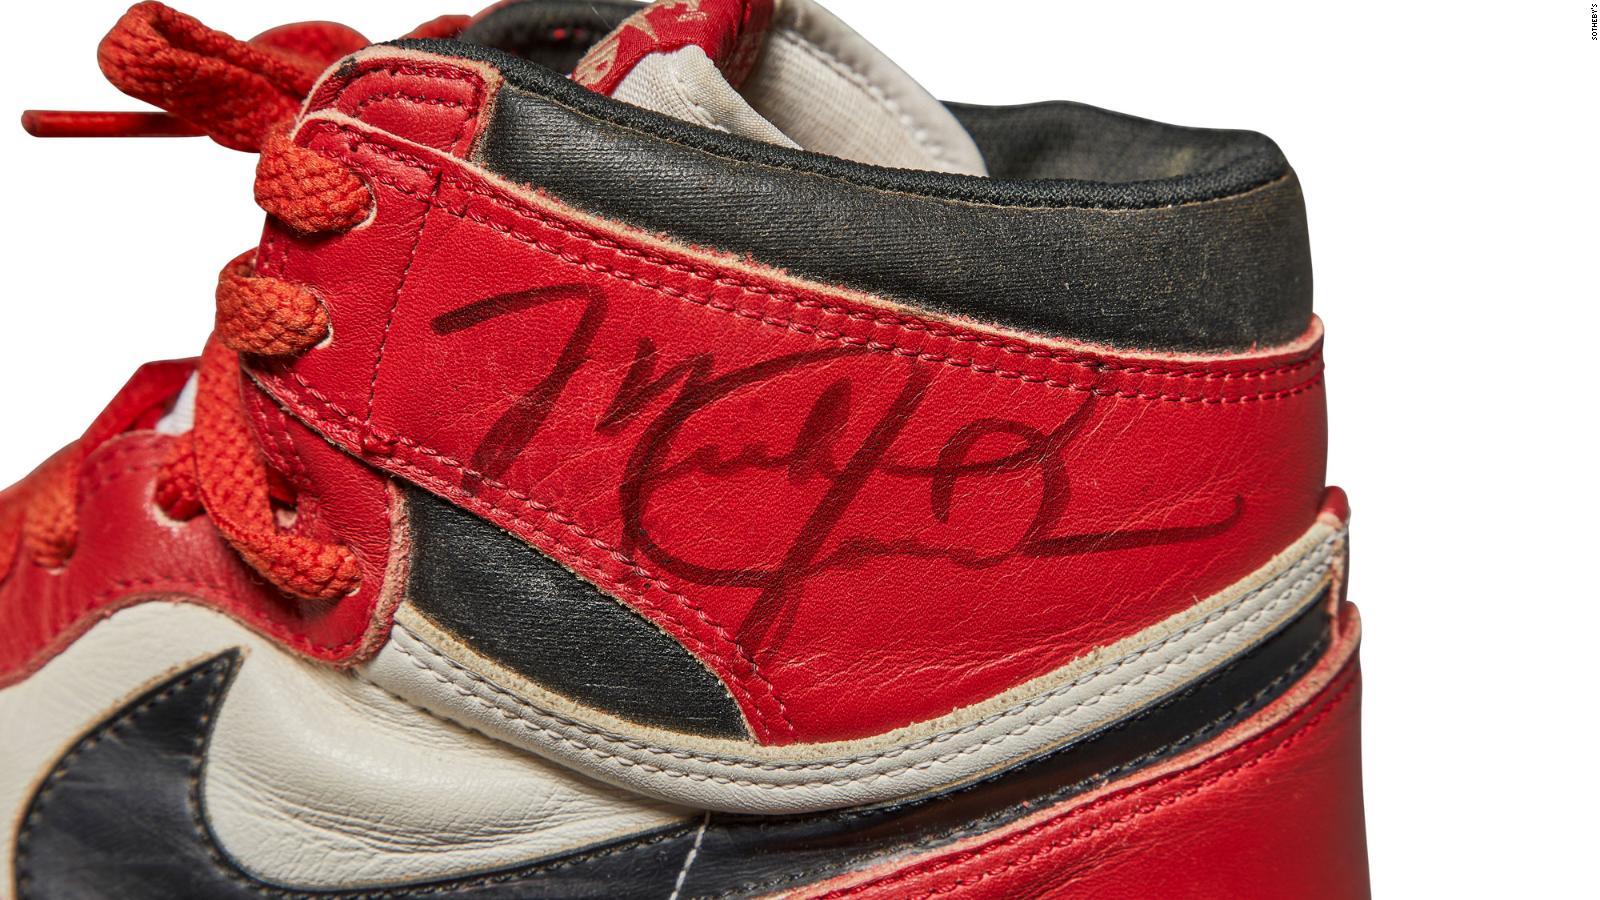 Itaca Atlas asesinato  Se cerró la subasta de estos Air Jordan usados por Michael Jordan | Video |  CNN